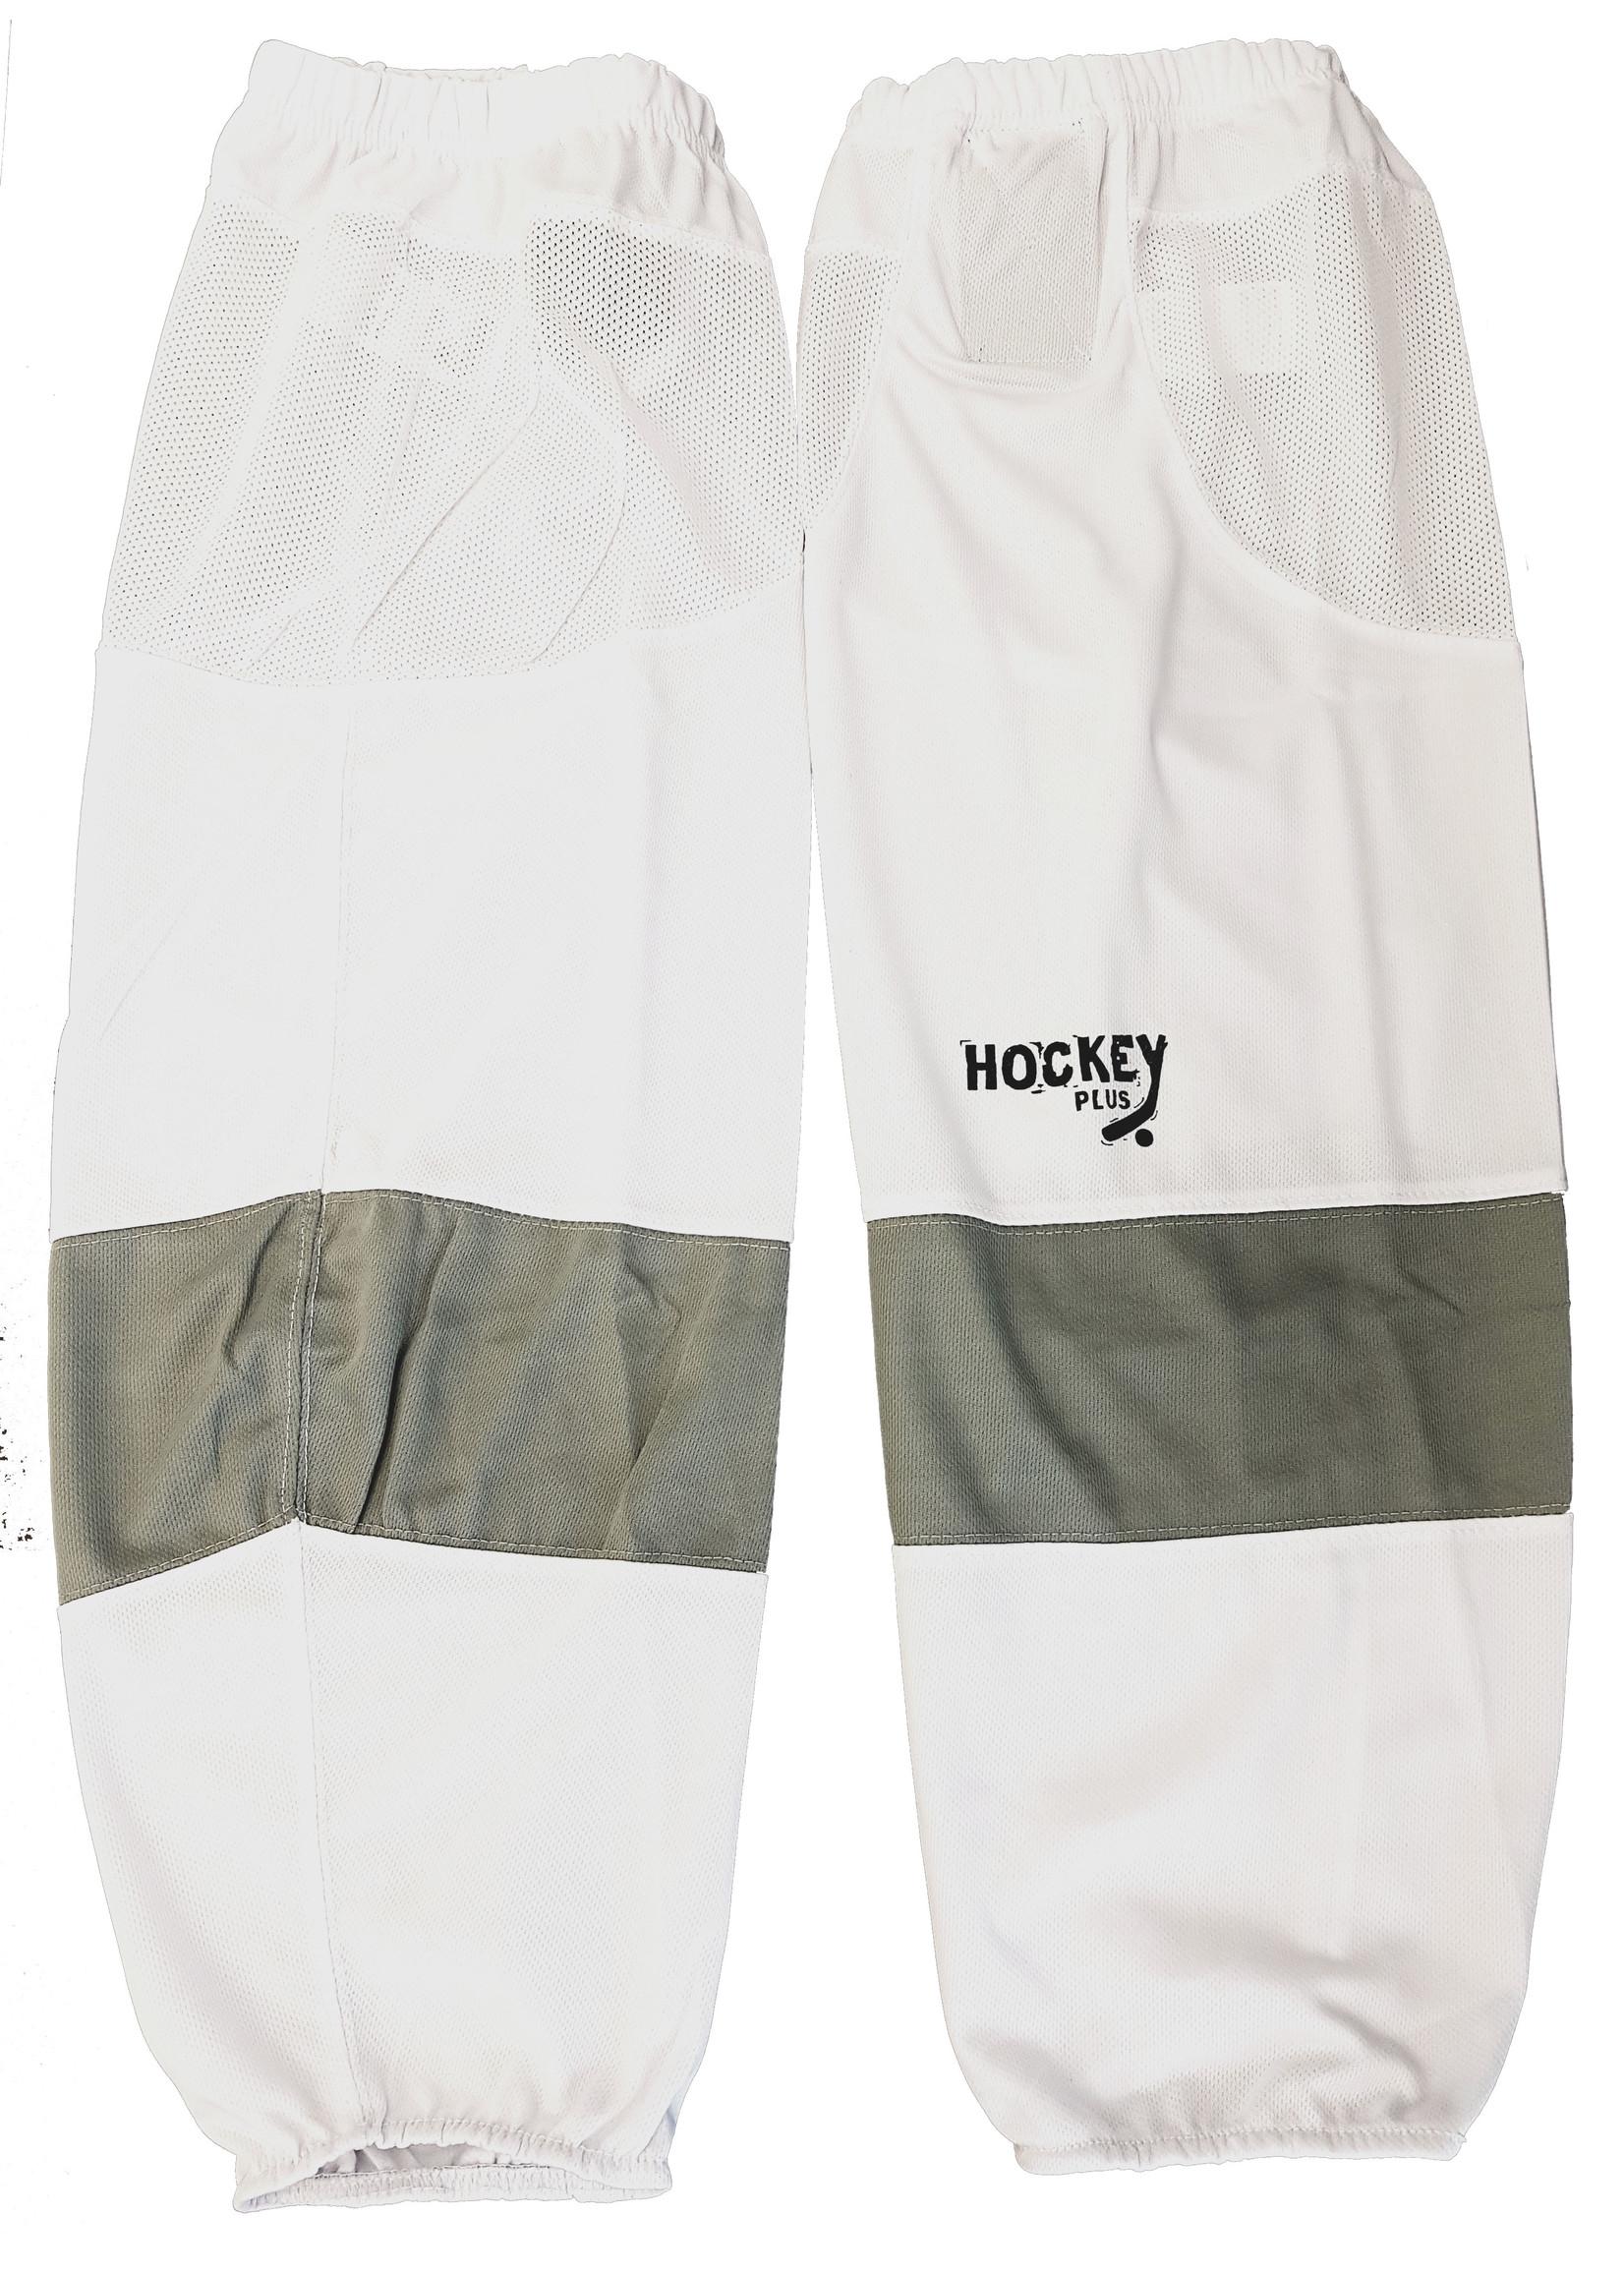 HOCKEY PLUS EDGE HOCKEY SOCKS